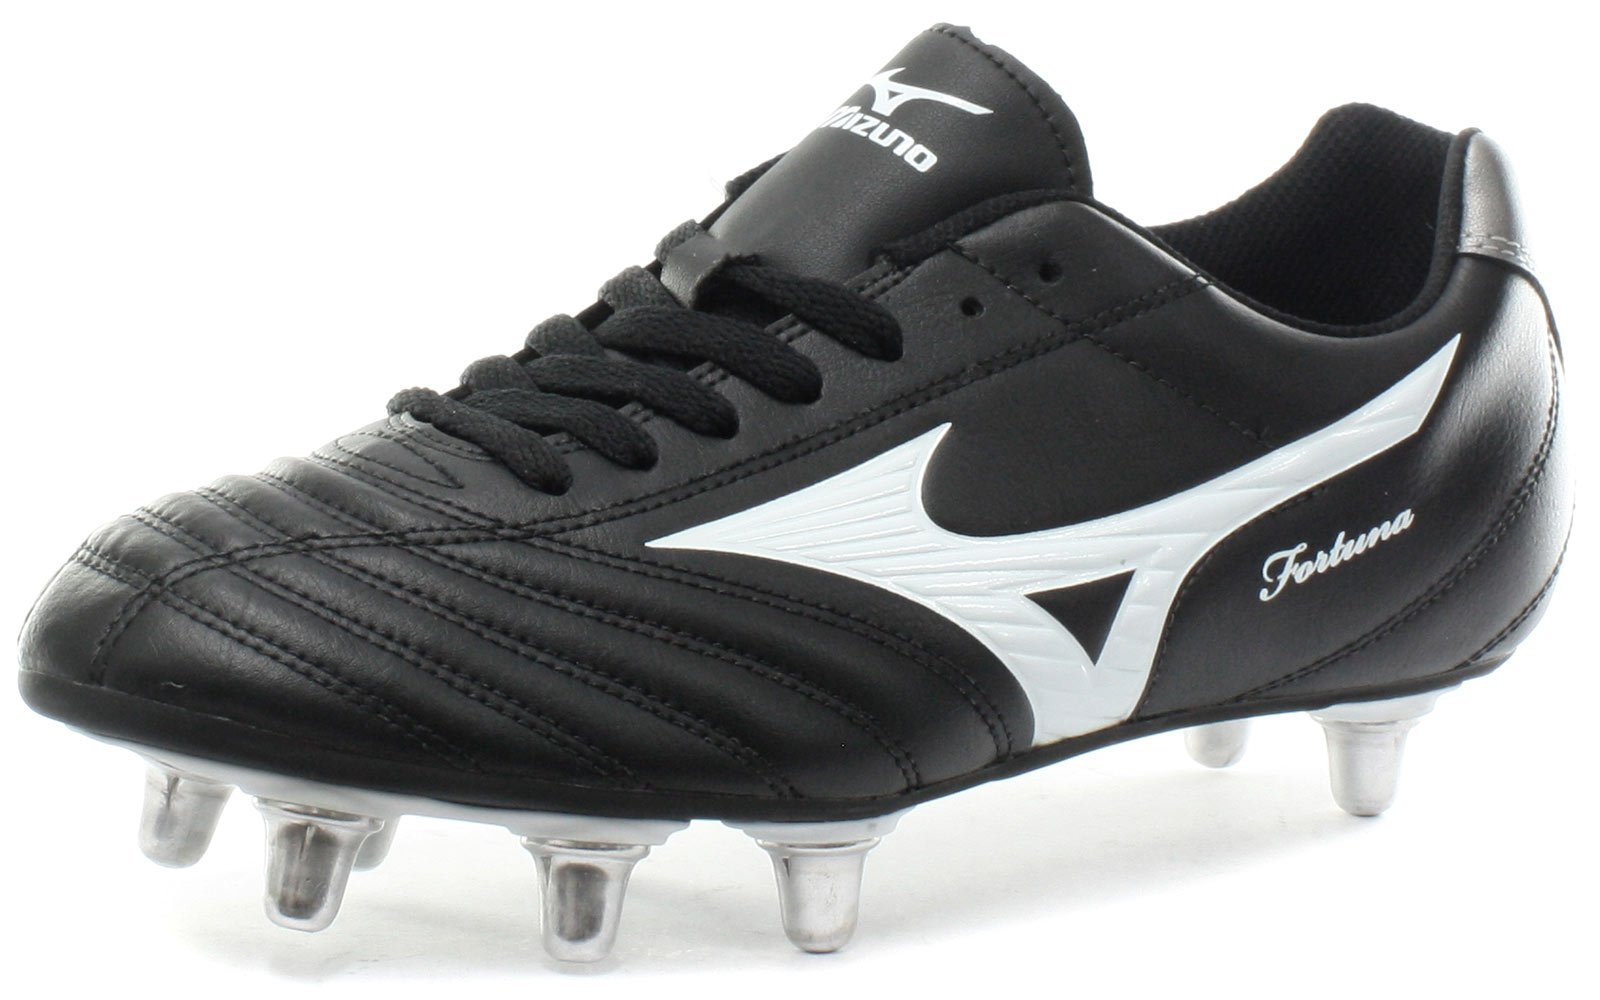 Mizuno Fortuna 4 Rugby Boots - 9.5 - Black by Mizuno